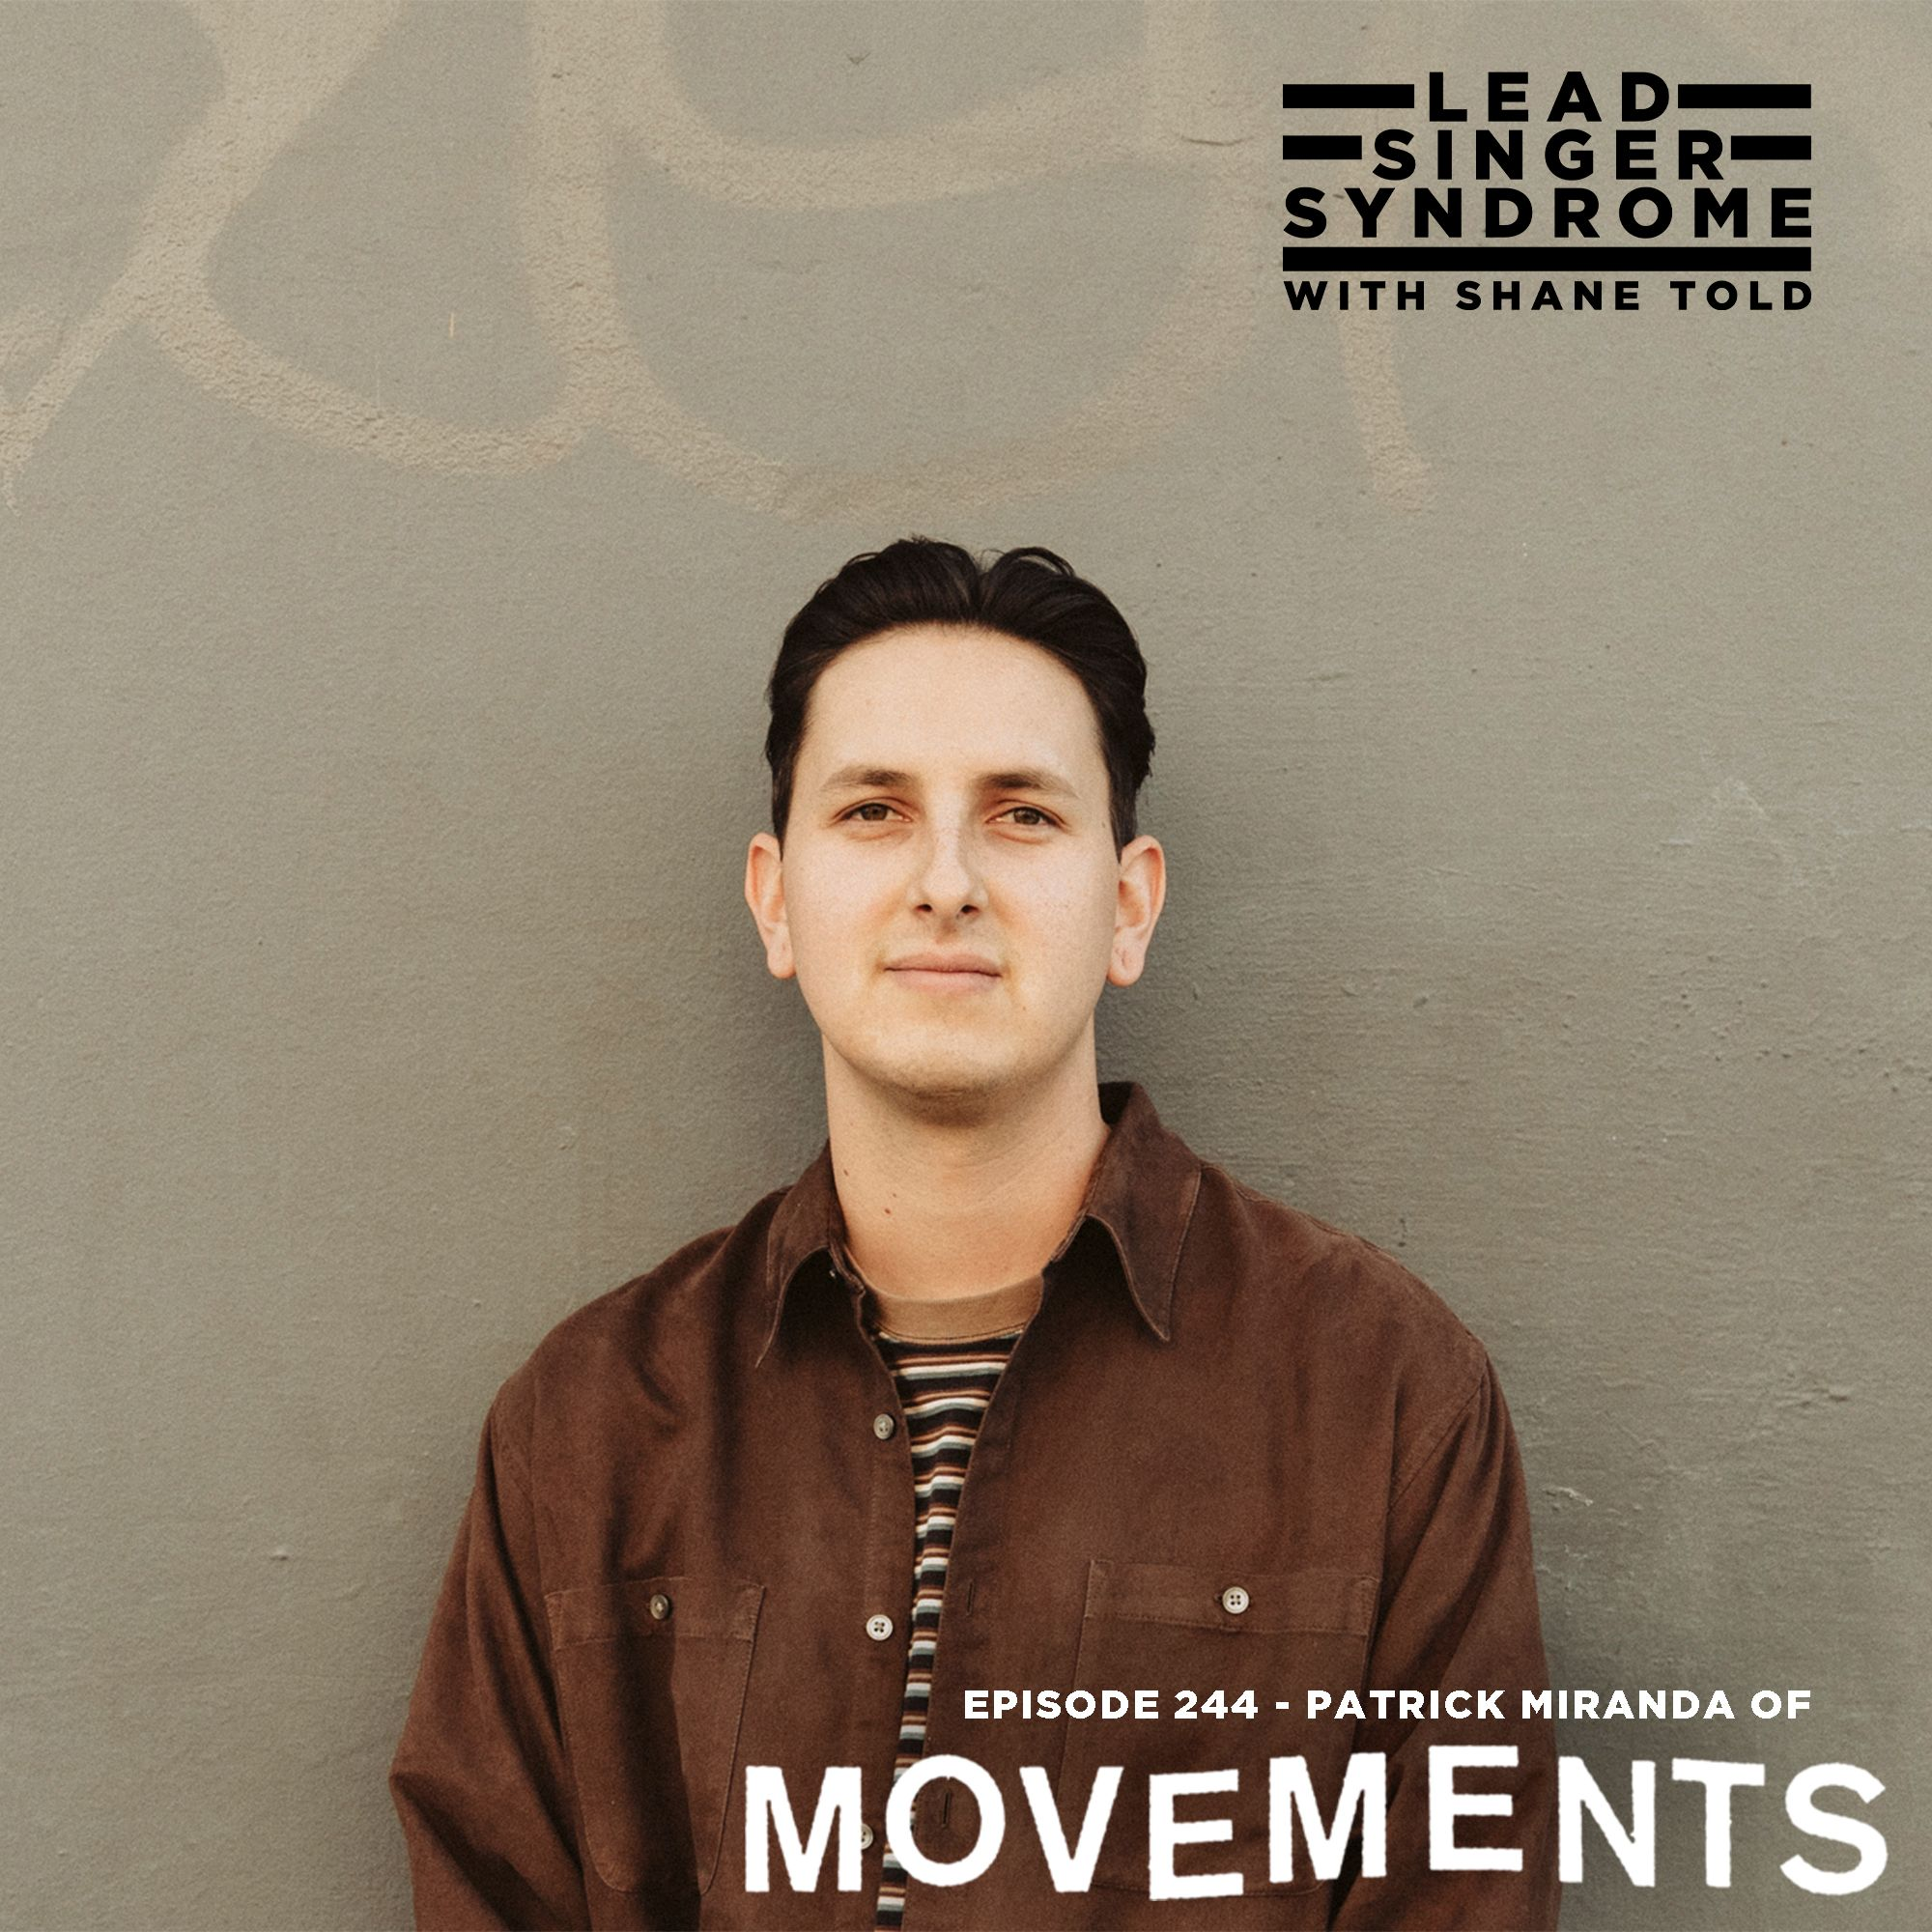 Patrick Miranda (Movements) returns!